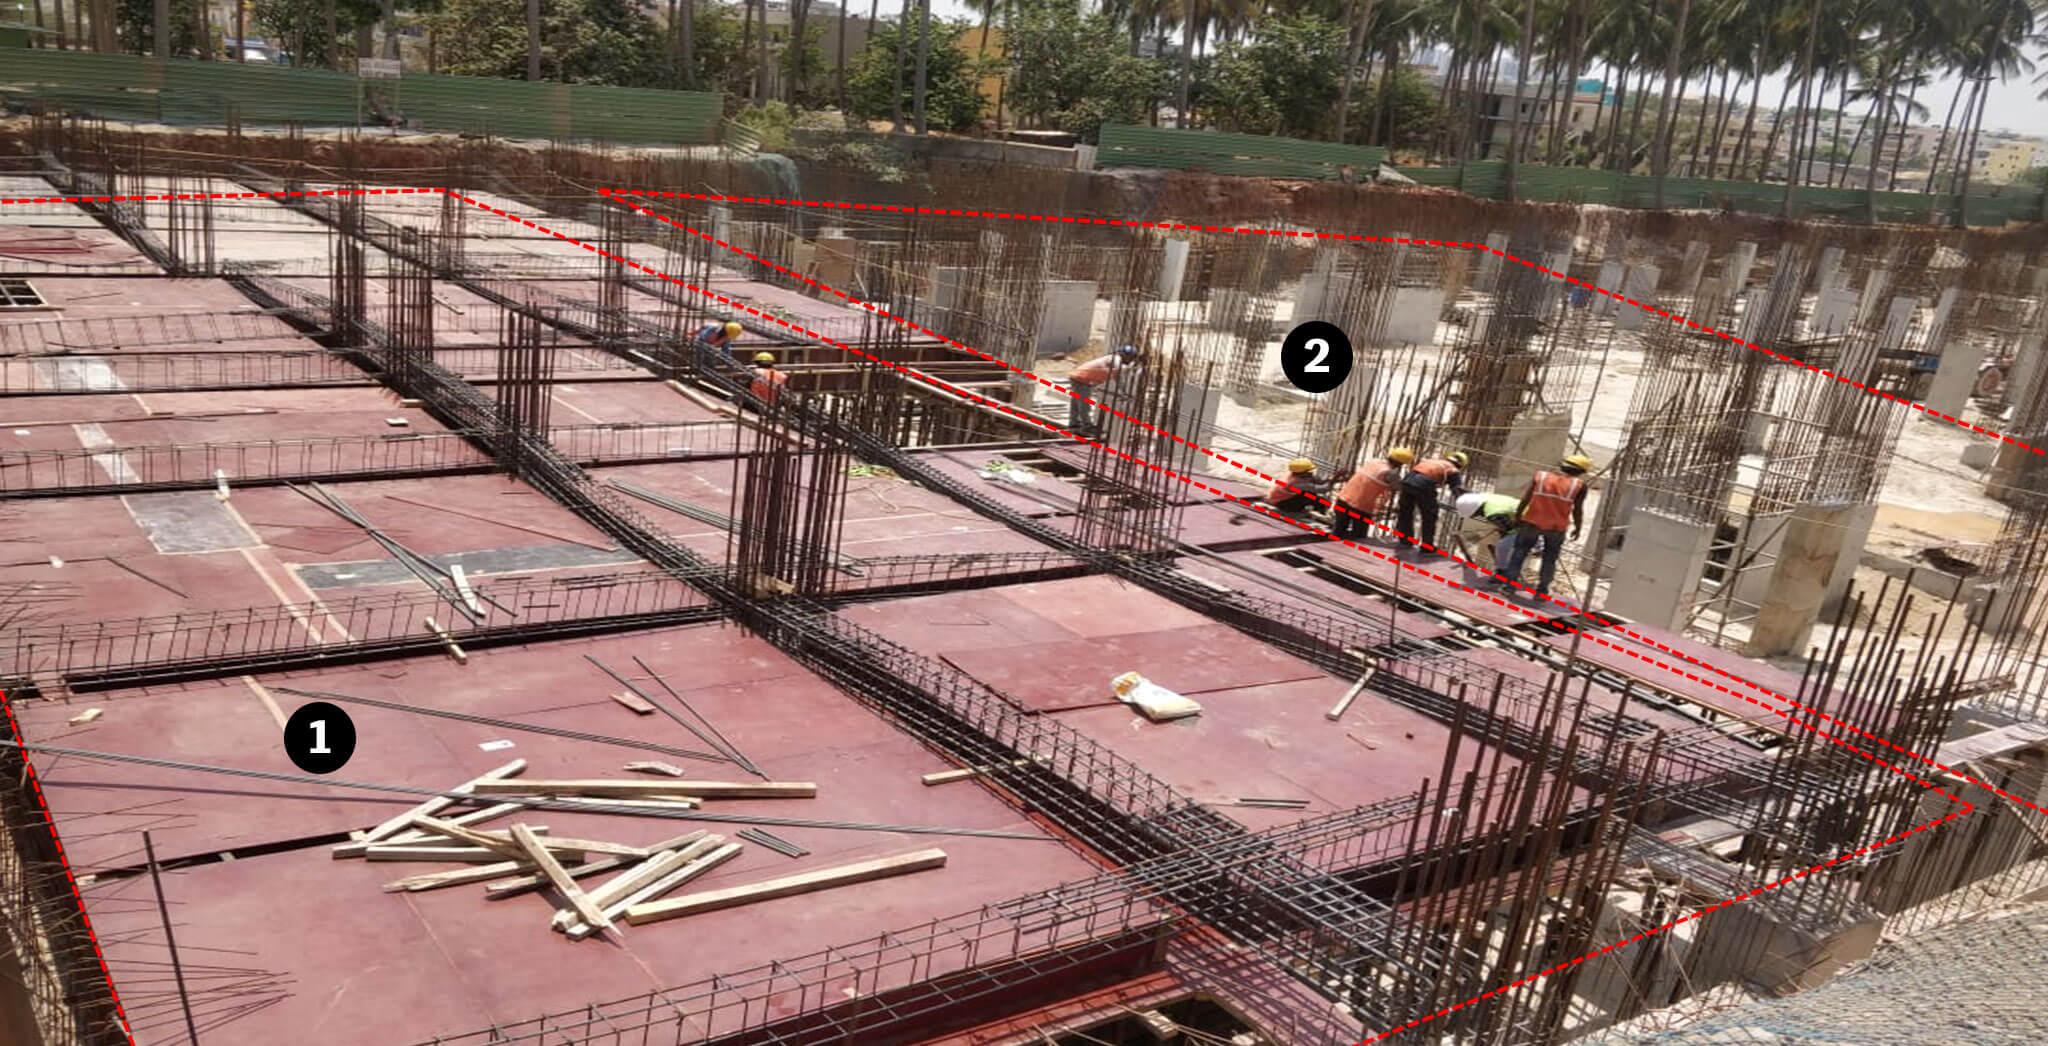 Mar 2019 - Tower A: Upper basement slab and columns work-in-progress